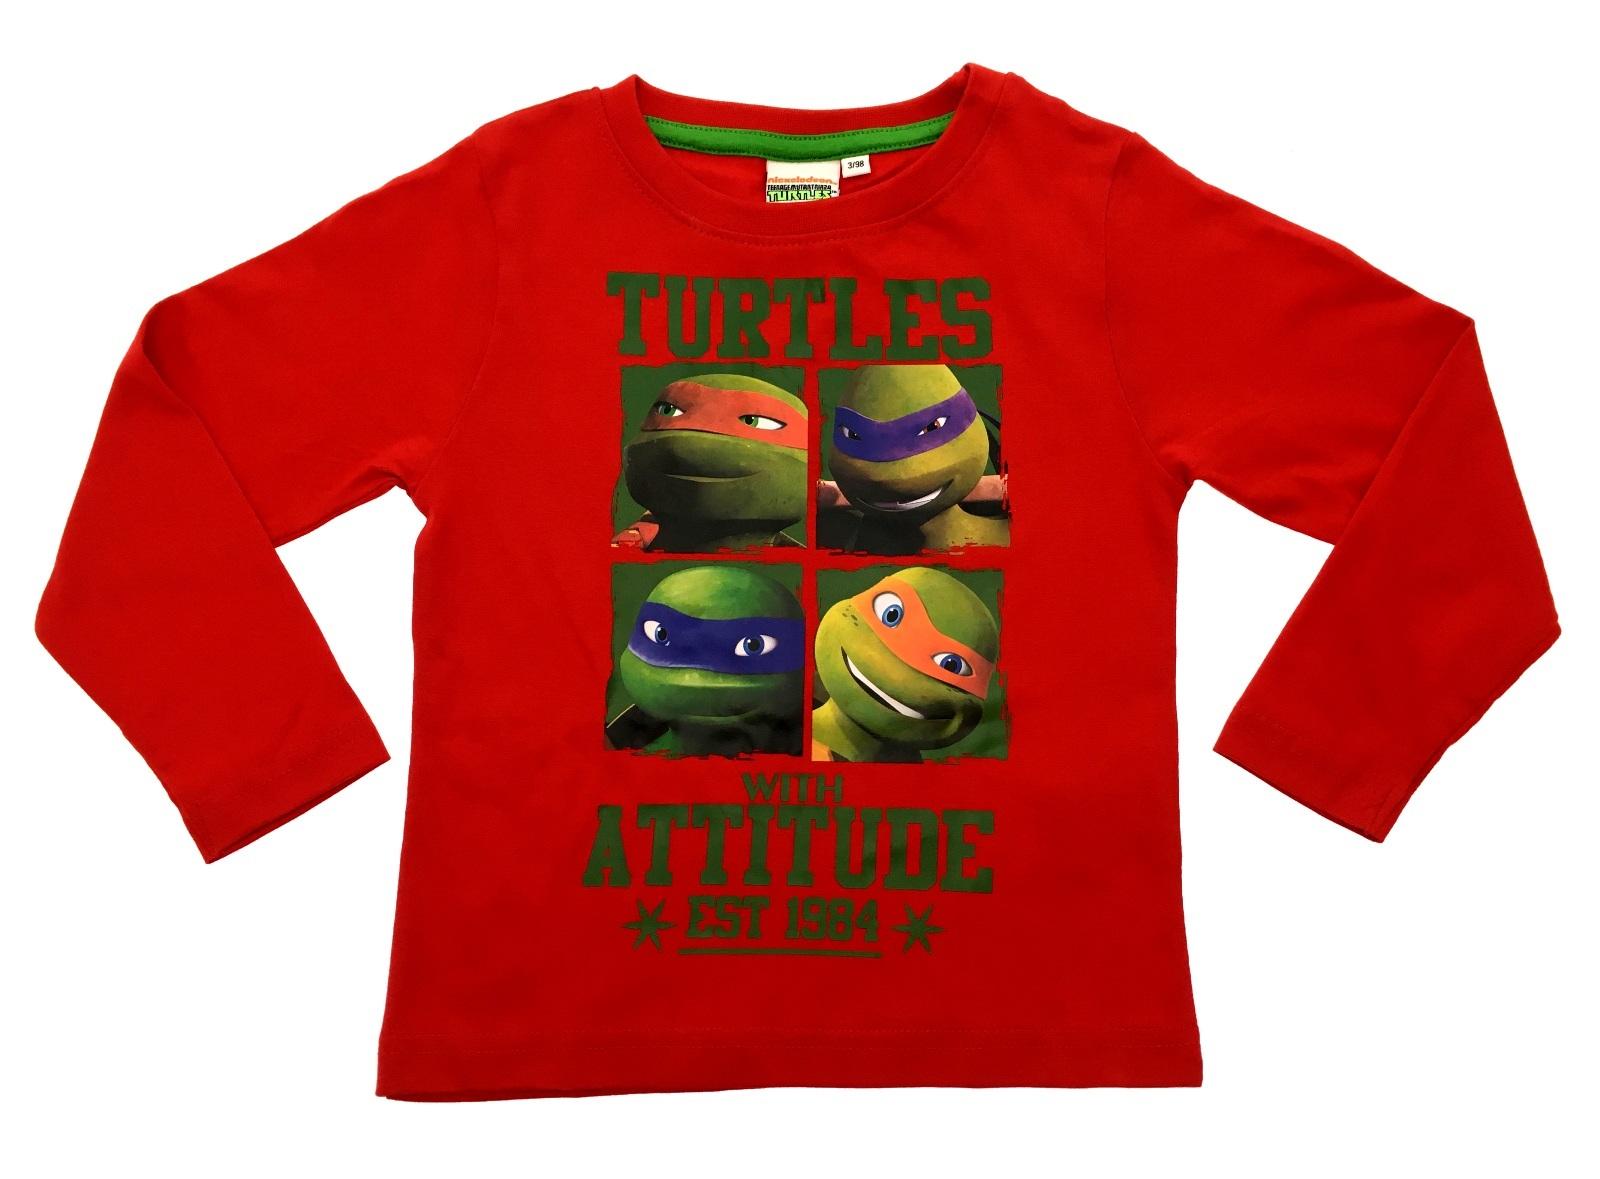 Boys long sleeve teenage mutant ninja turtles t shirt kids for What size shirt for 8 year old boy